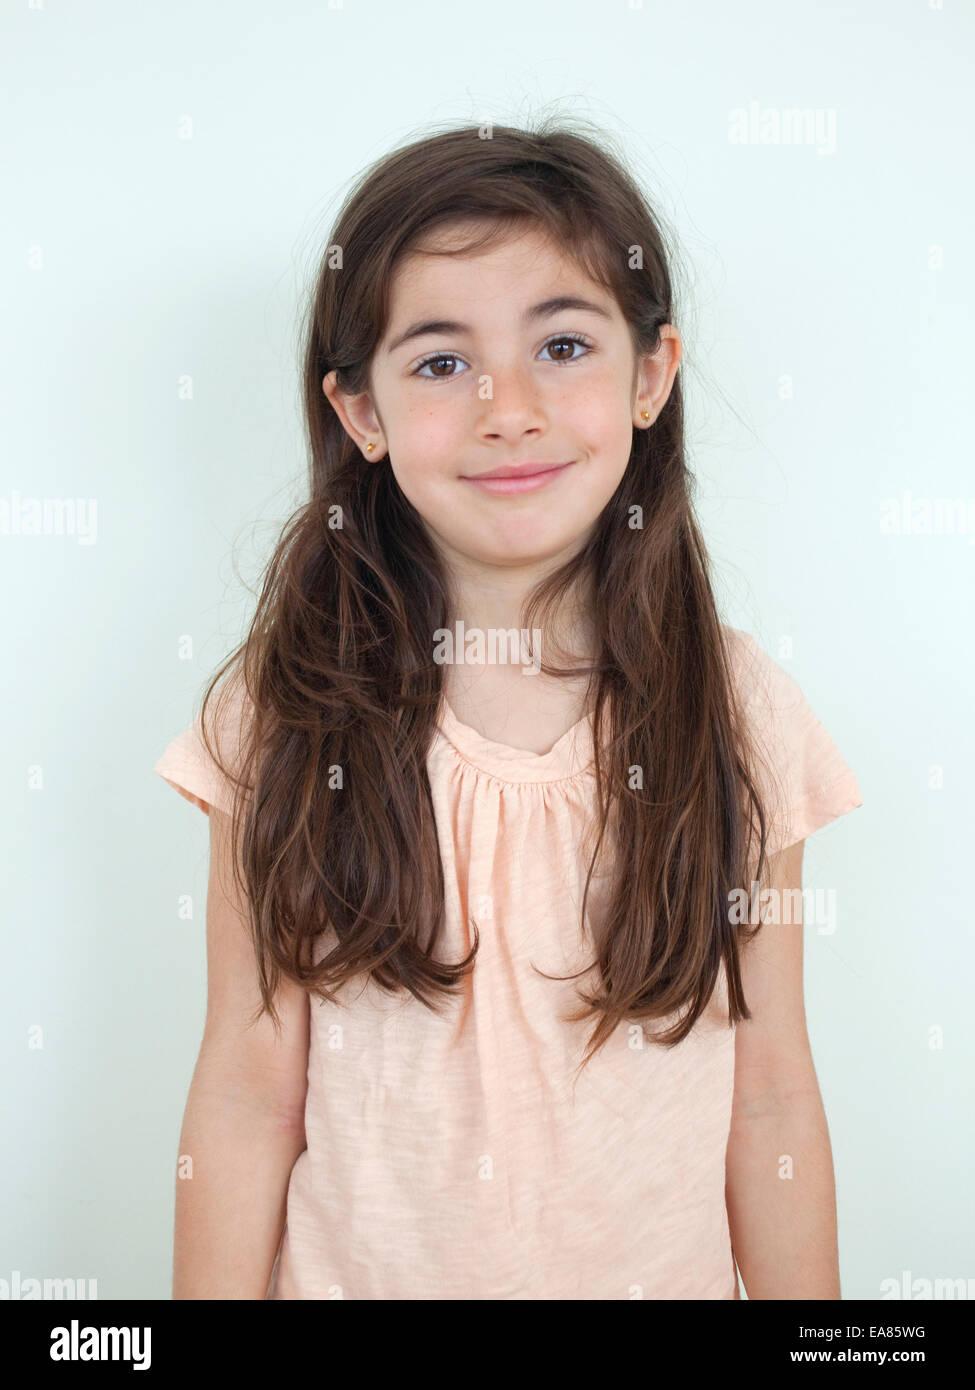 Porträt eines 7-jährigen Mädchens Stockbild